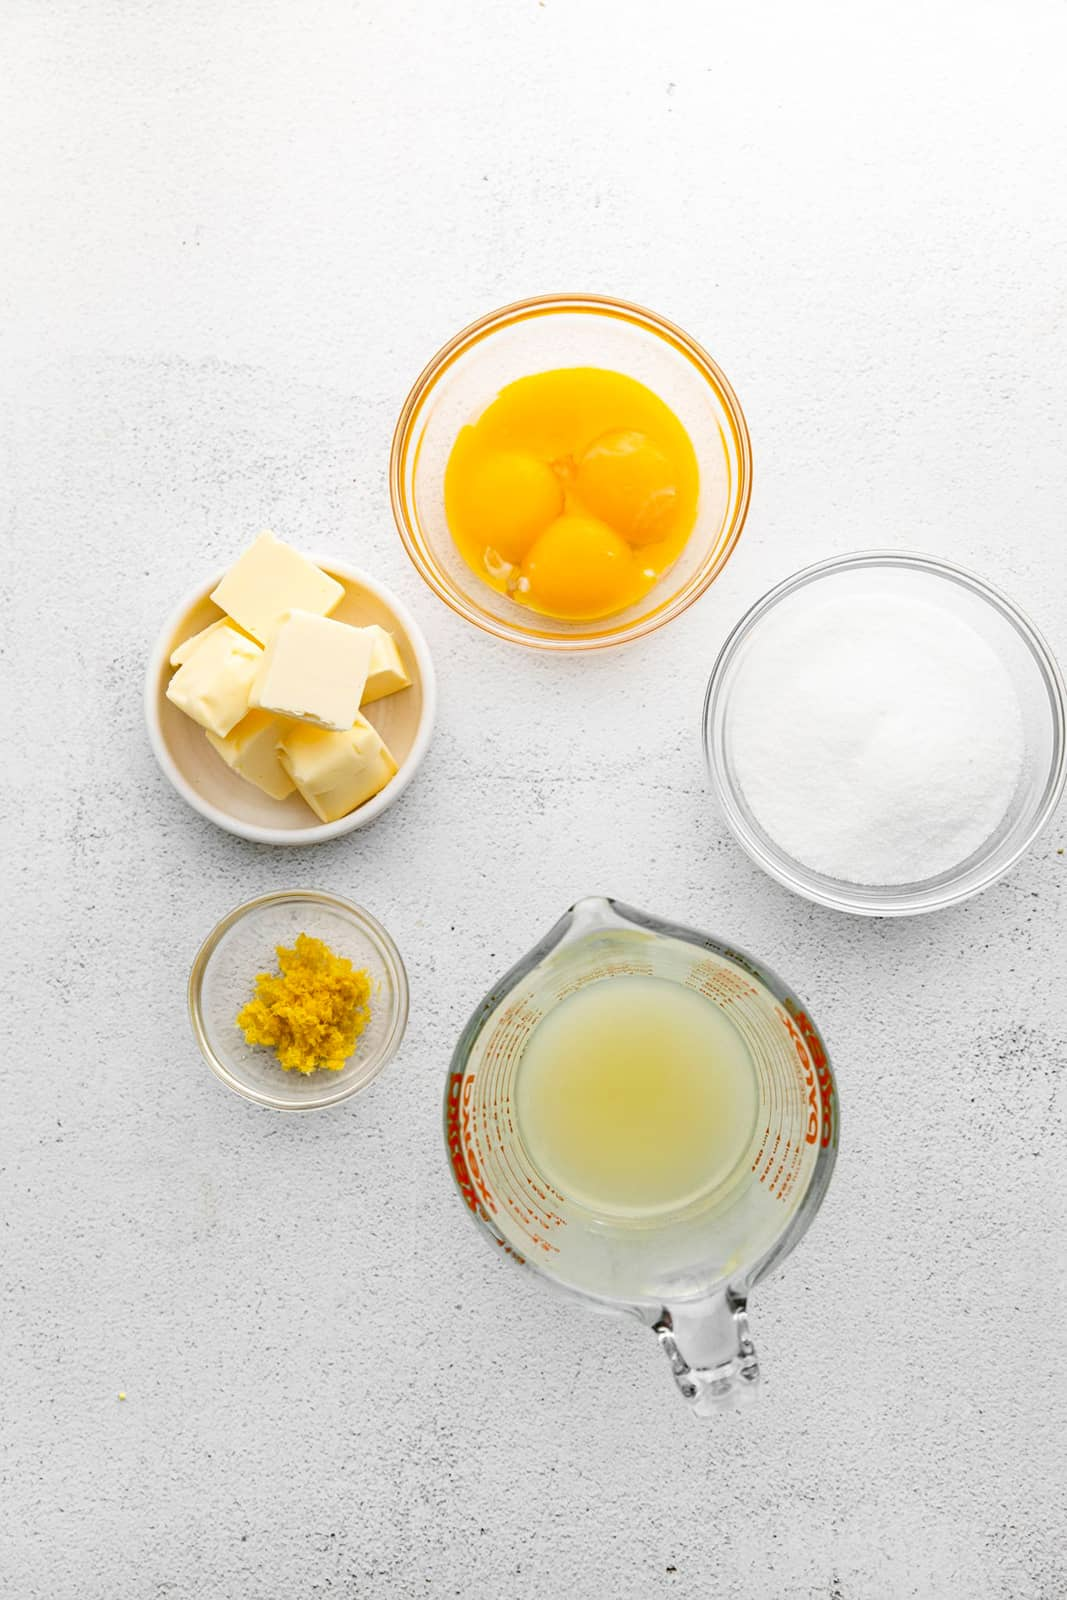 Ingredients need to make Lemon Curd